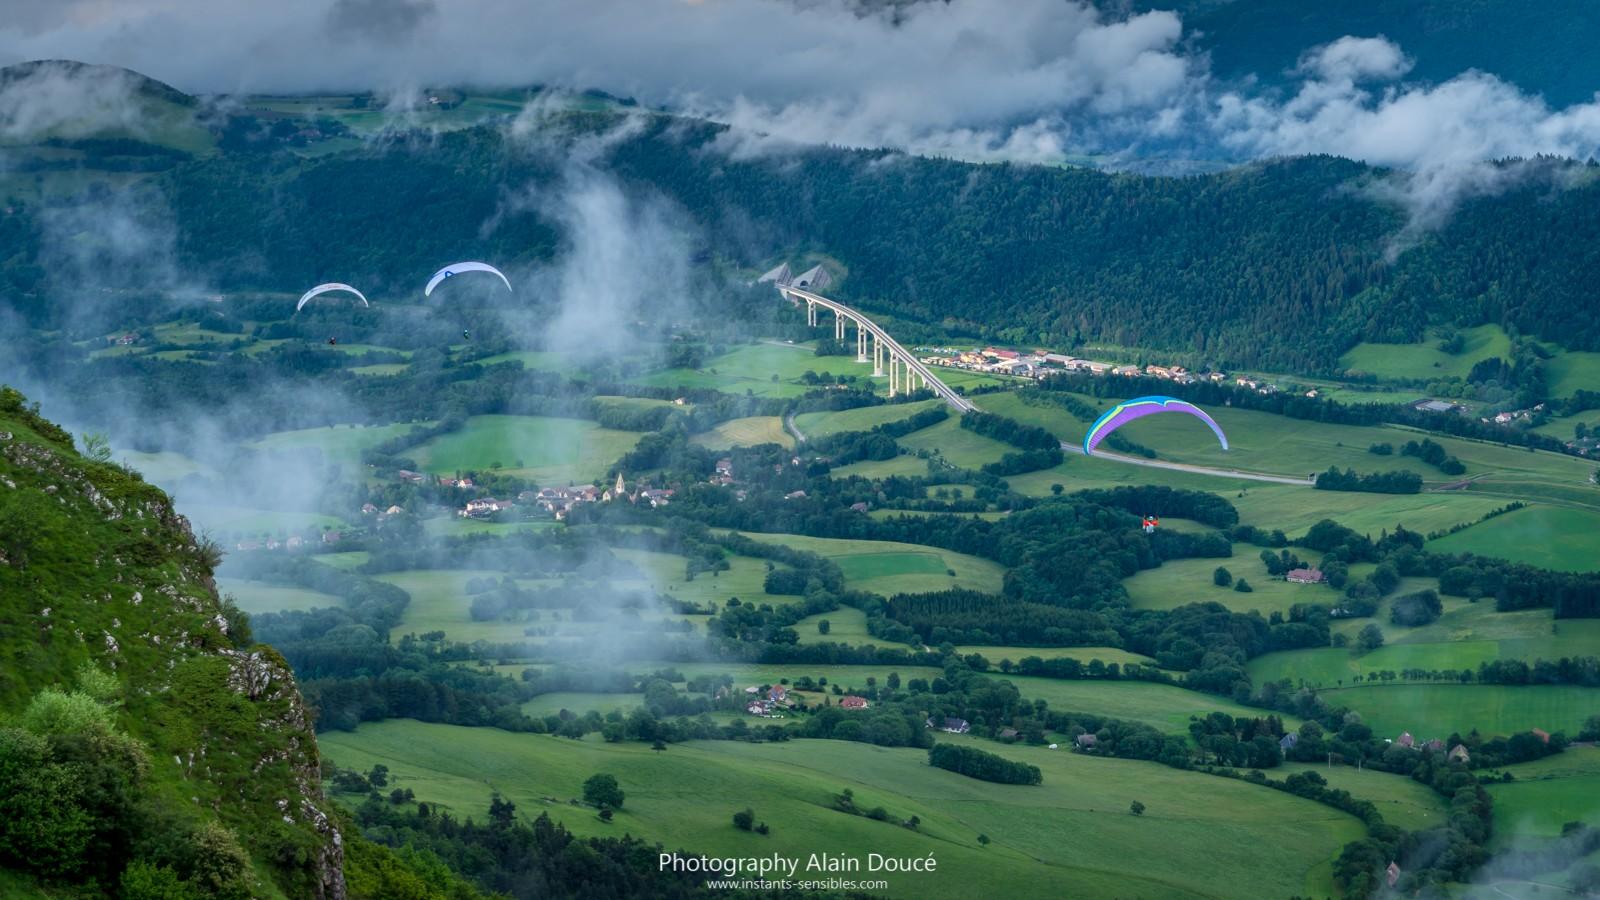 2018-06-10 Airtour2018 J3 BD Photo Alain Doucé-73